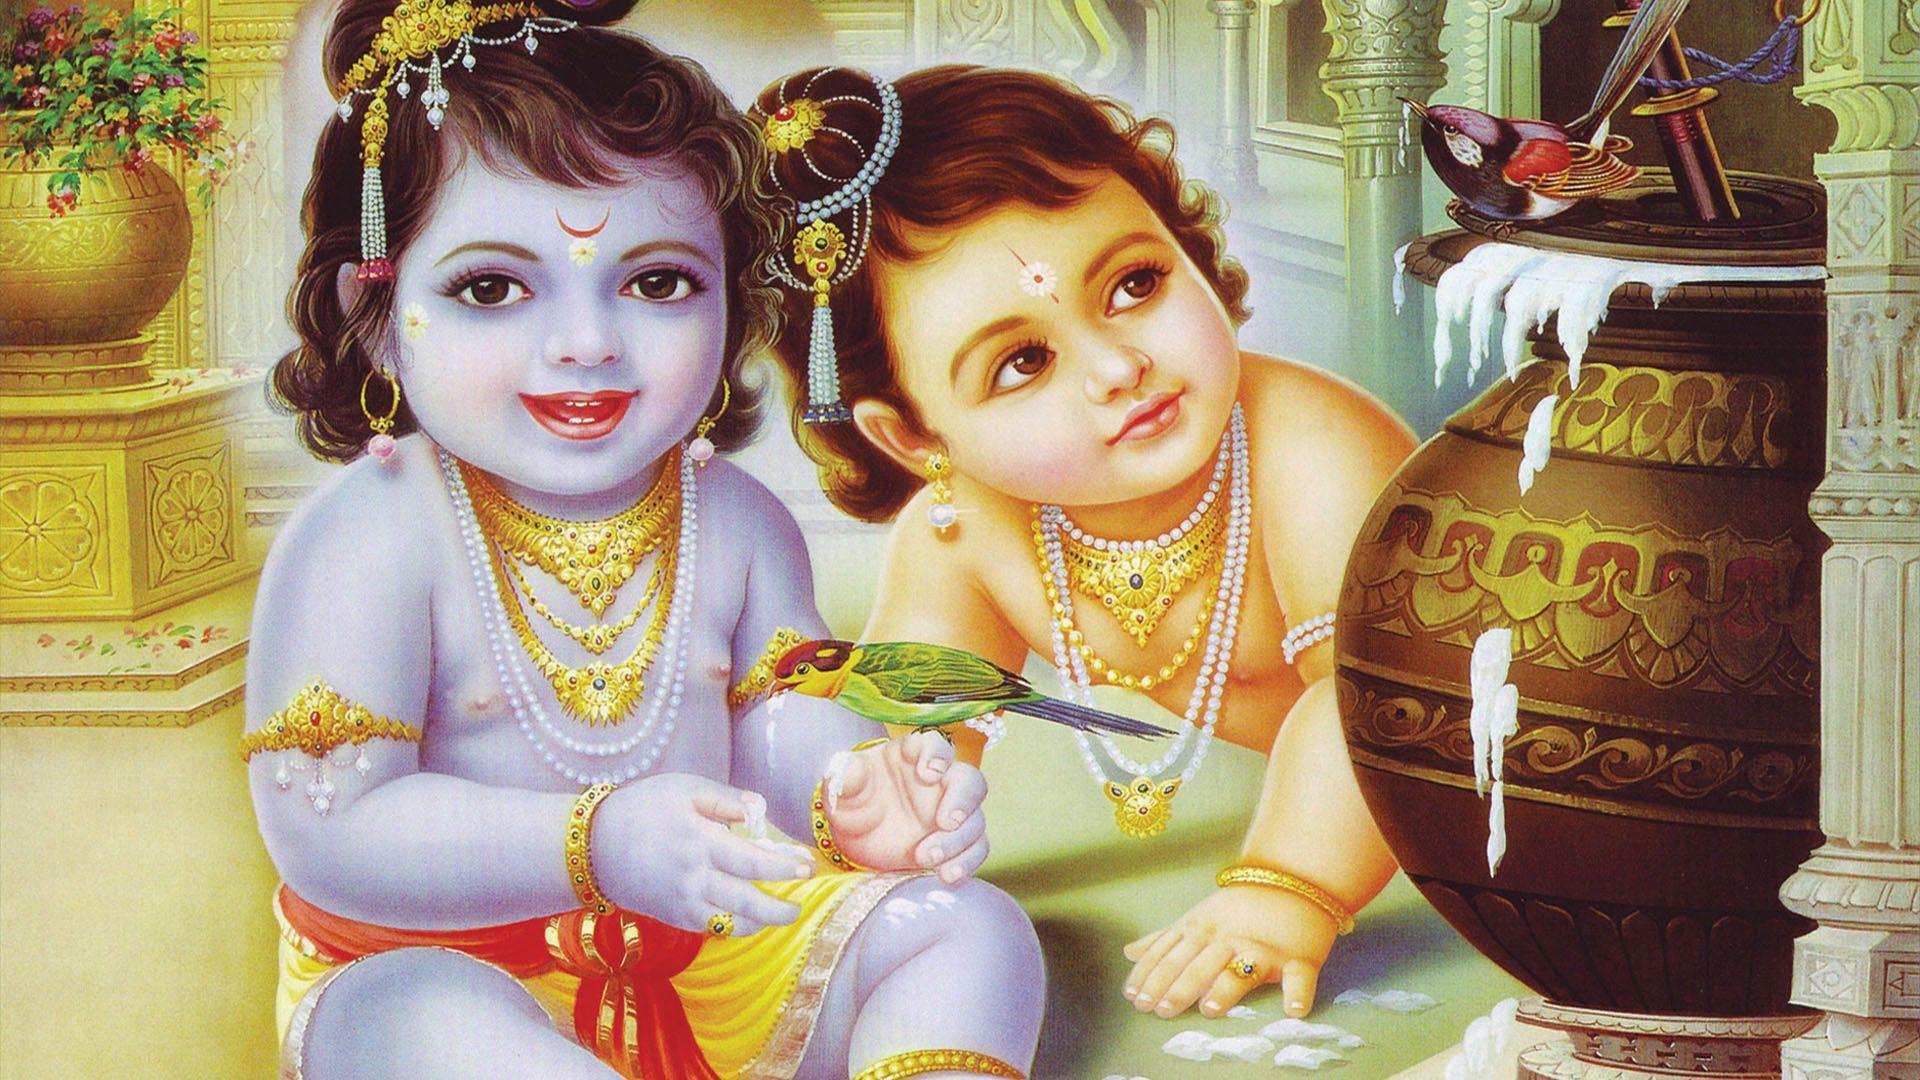 Little Krishna Wallpapers Wallpaper Cave